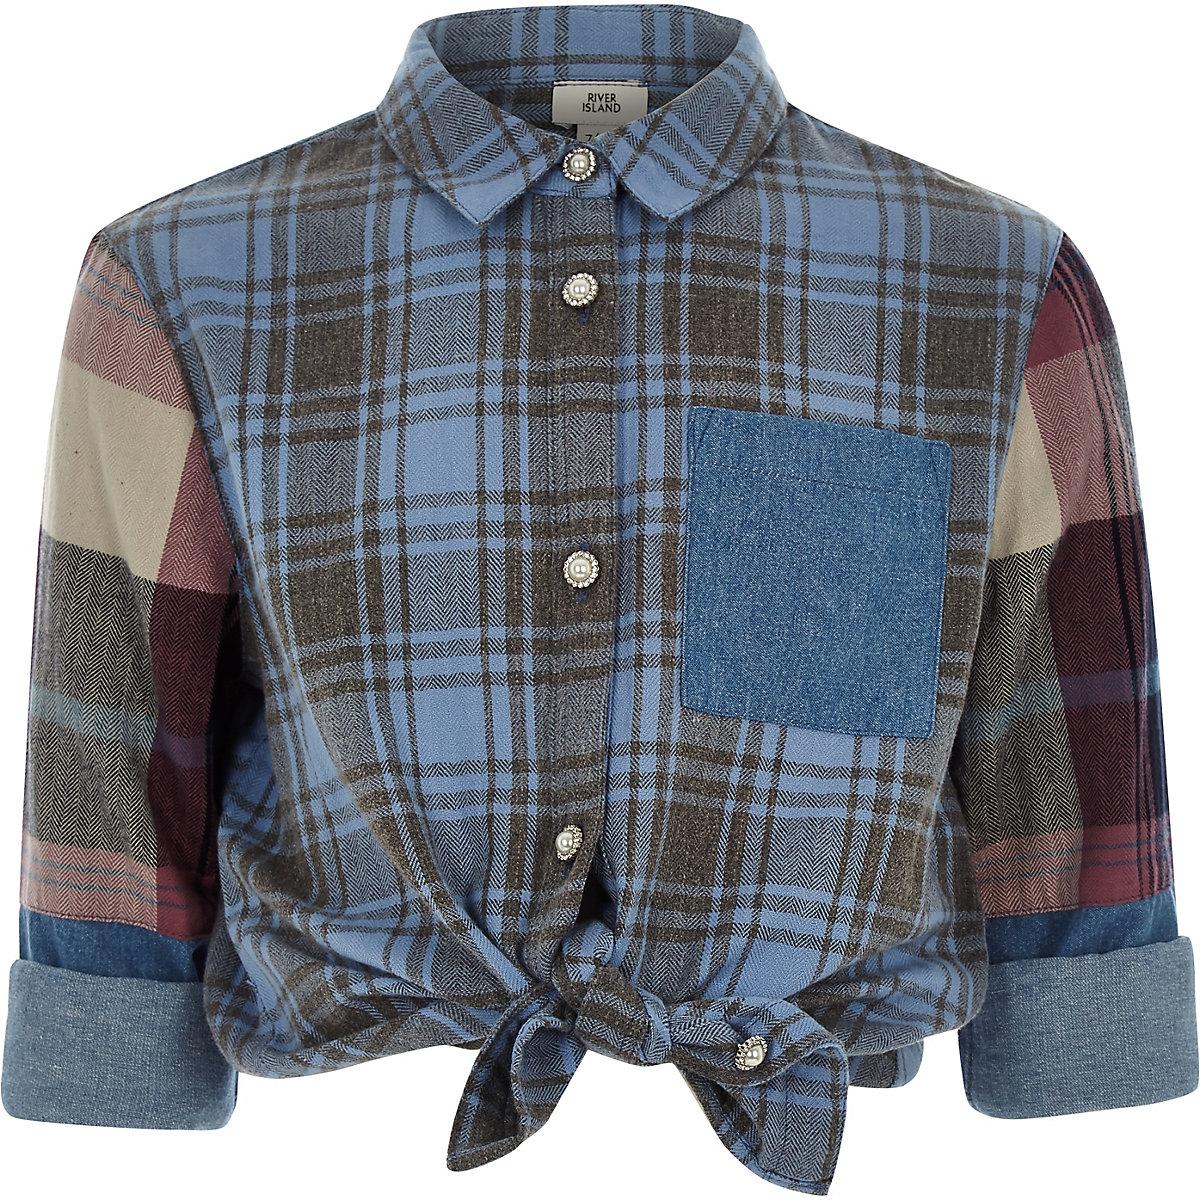 Girls blue check rhinestone button shirt